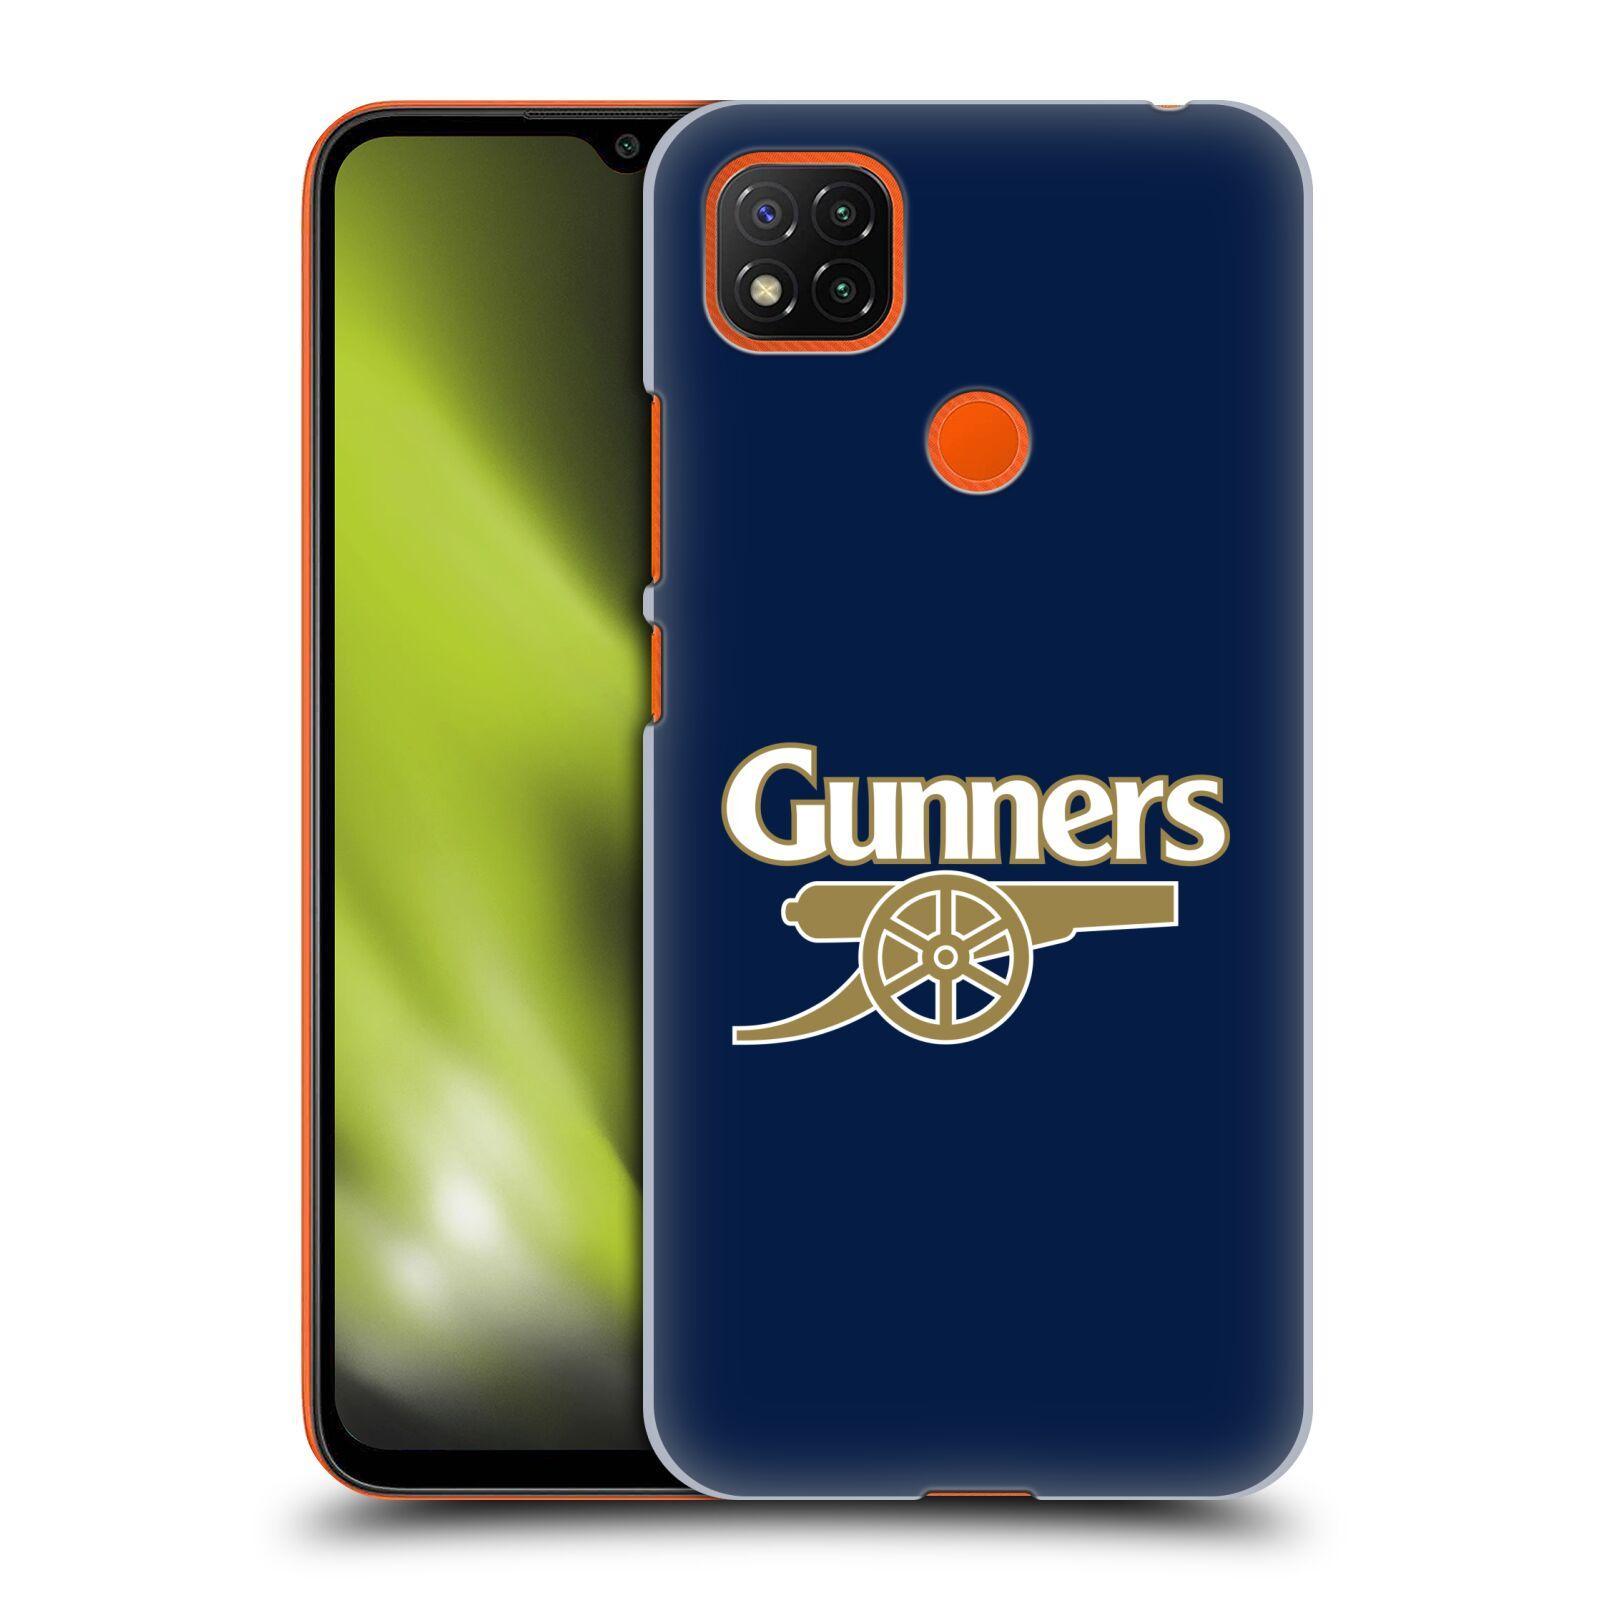 Plastové pouzdro na mobil Xiaomi Redmi 9C - Head Case - Arsenal FC - Gunners